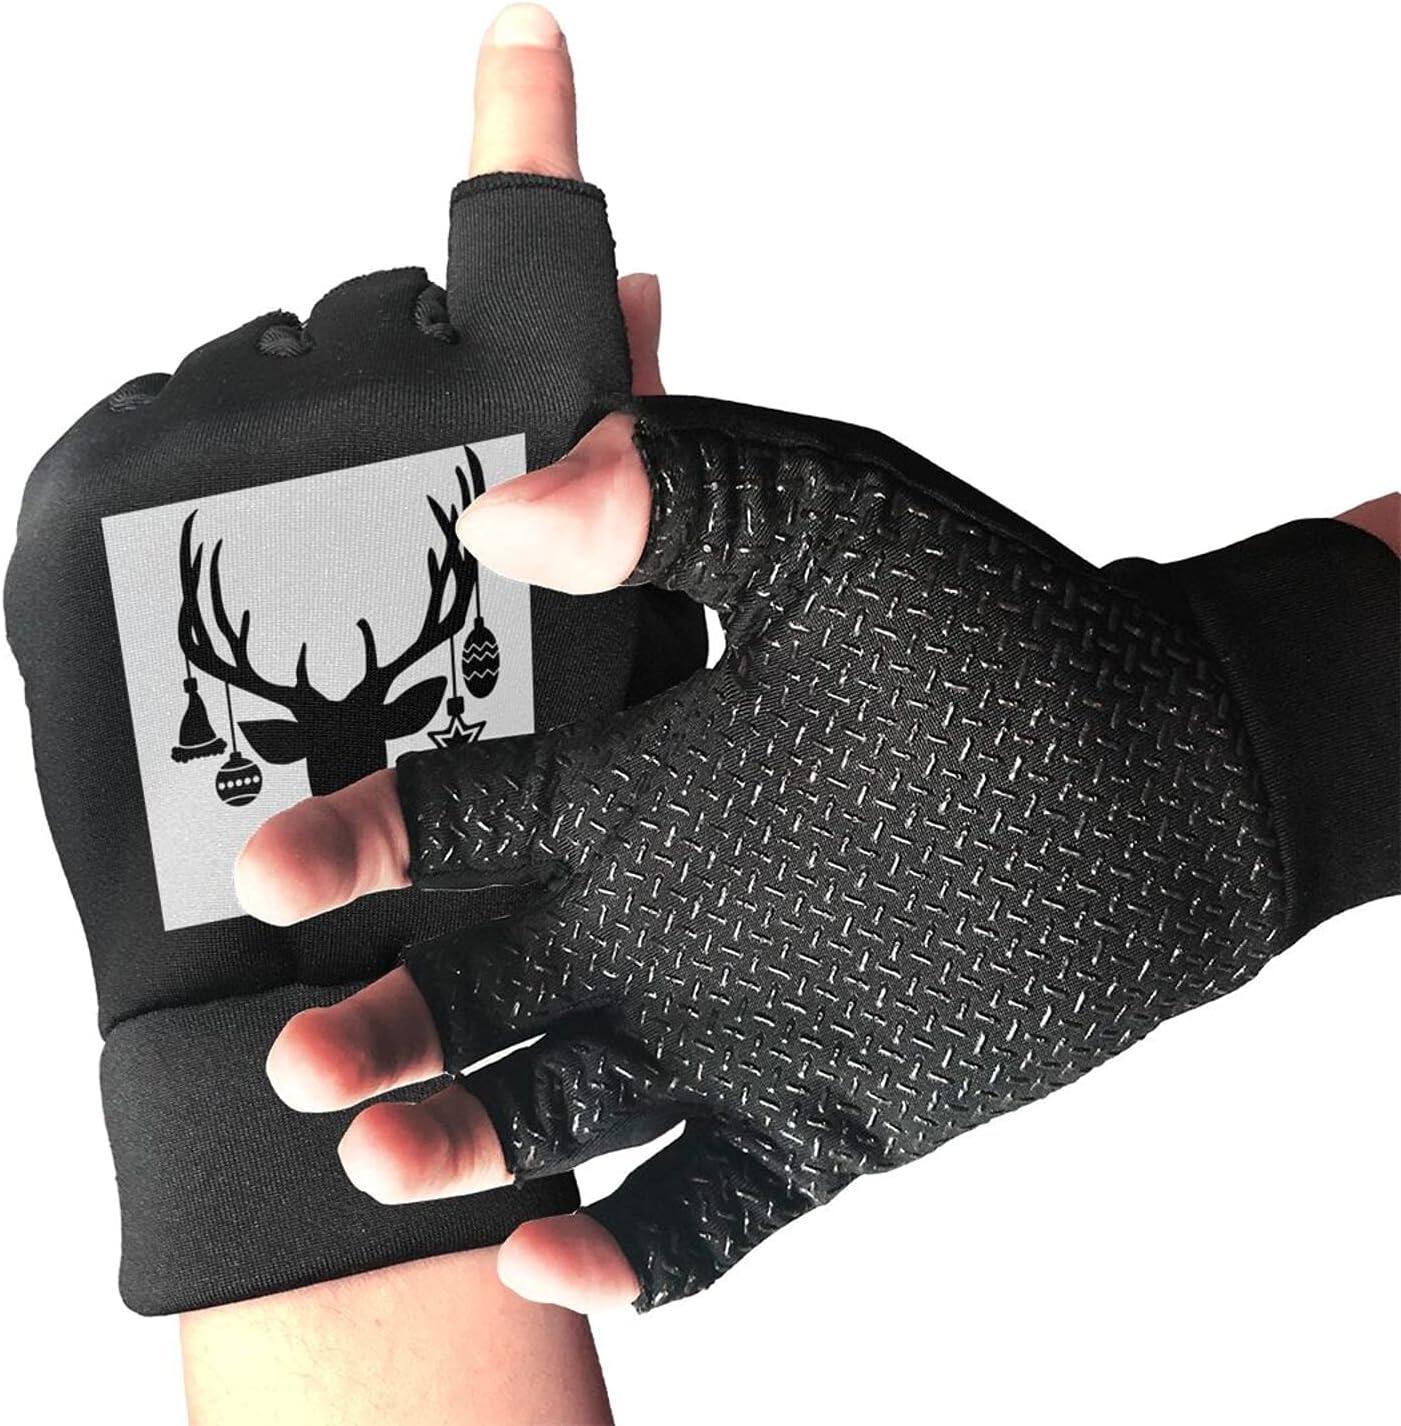 Merry Christmas Unisex Half Finger Non-Slip Gloves Lightweight depot Online limited product D